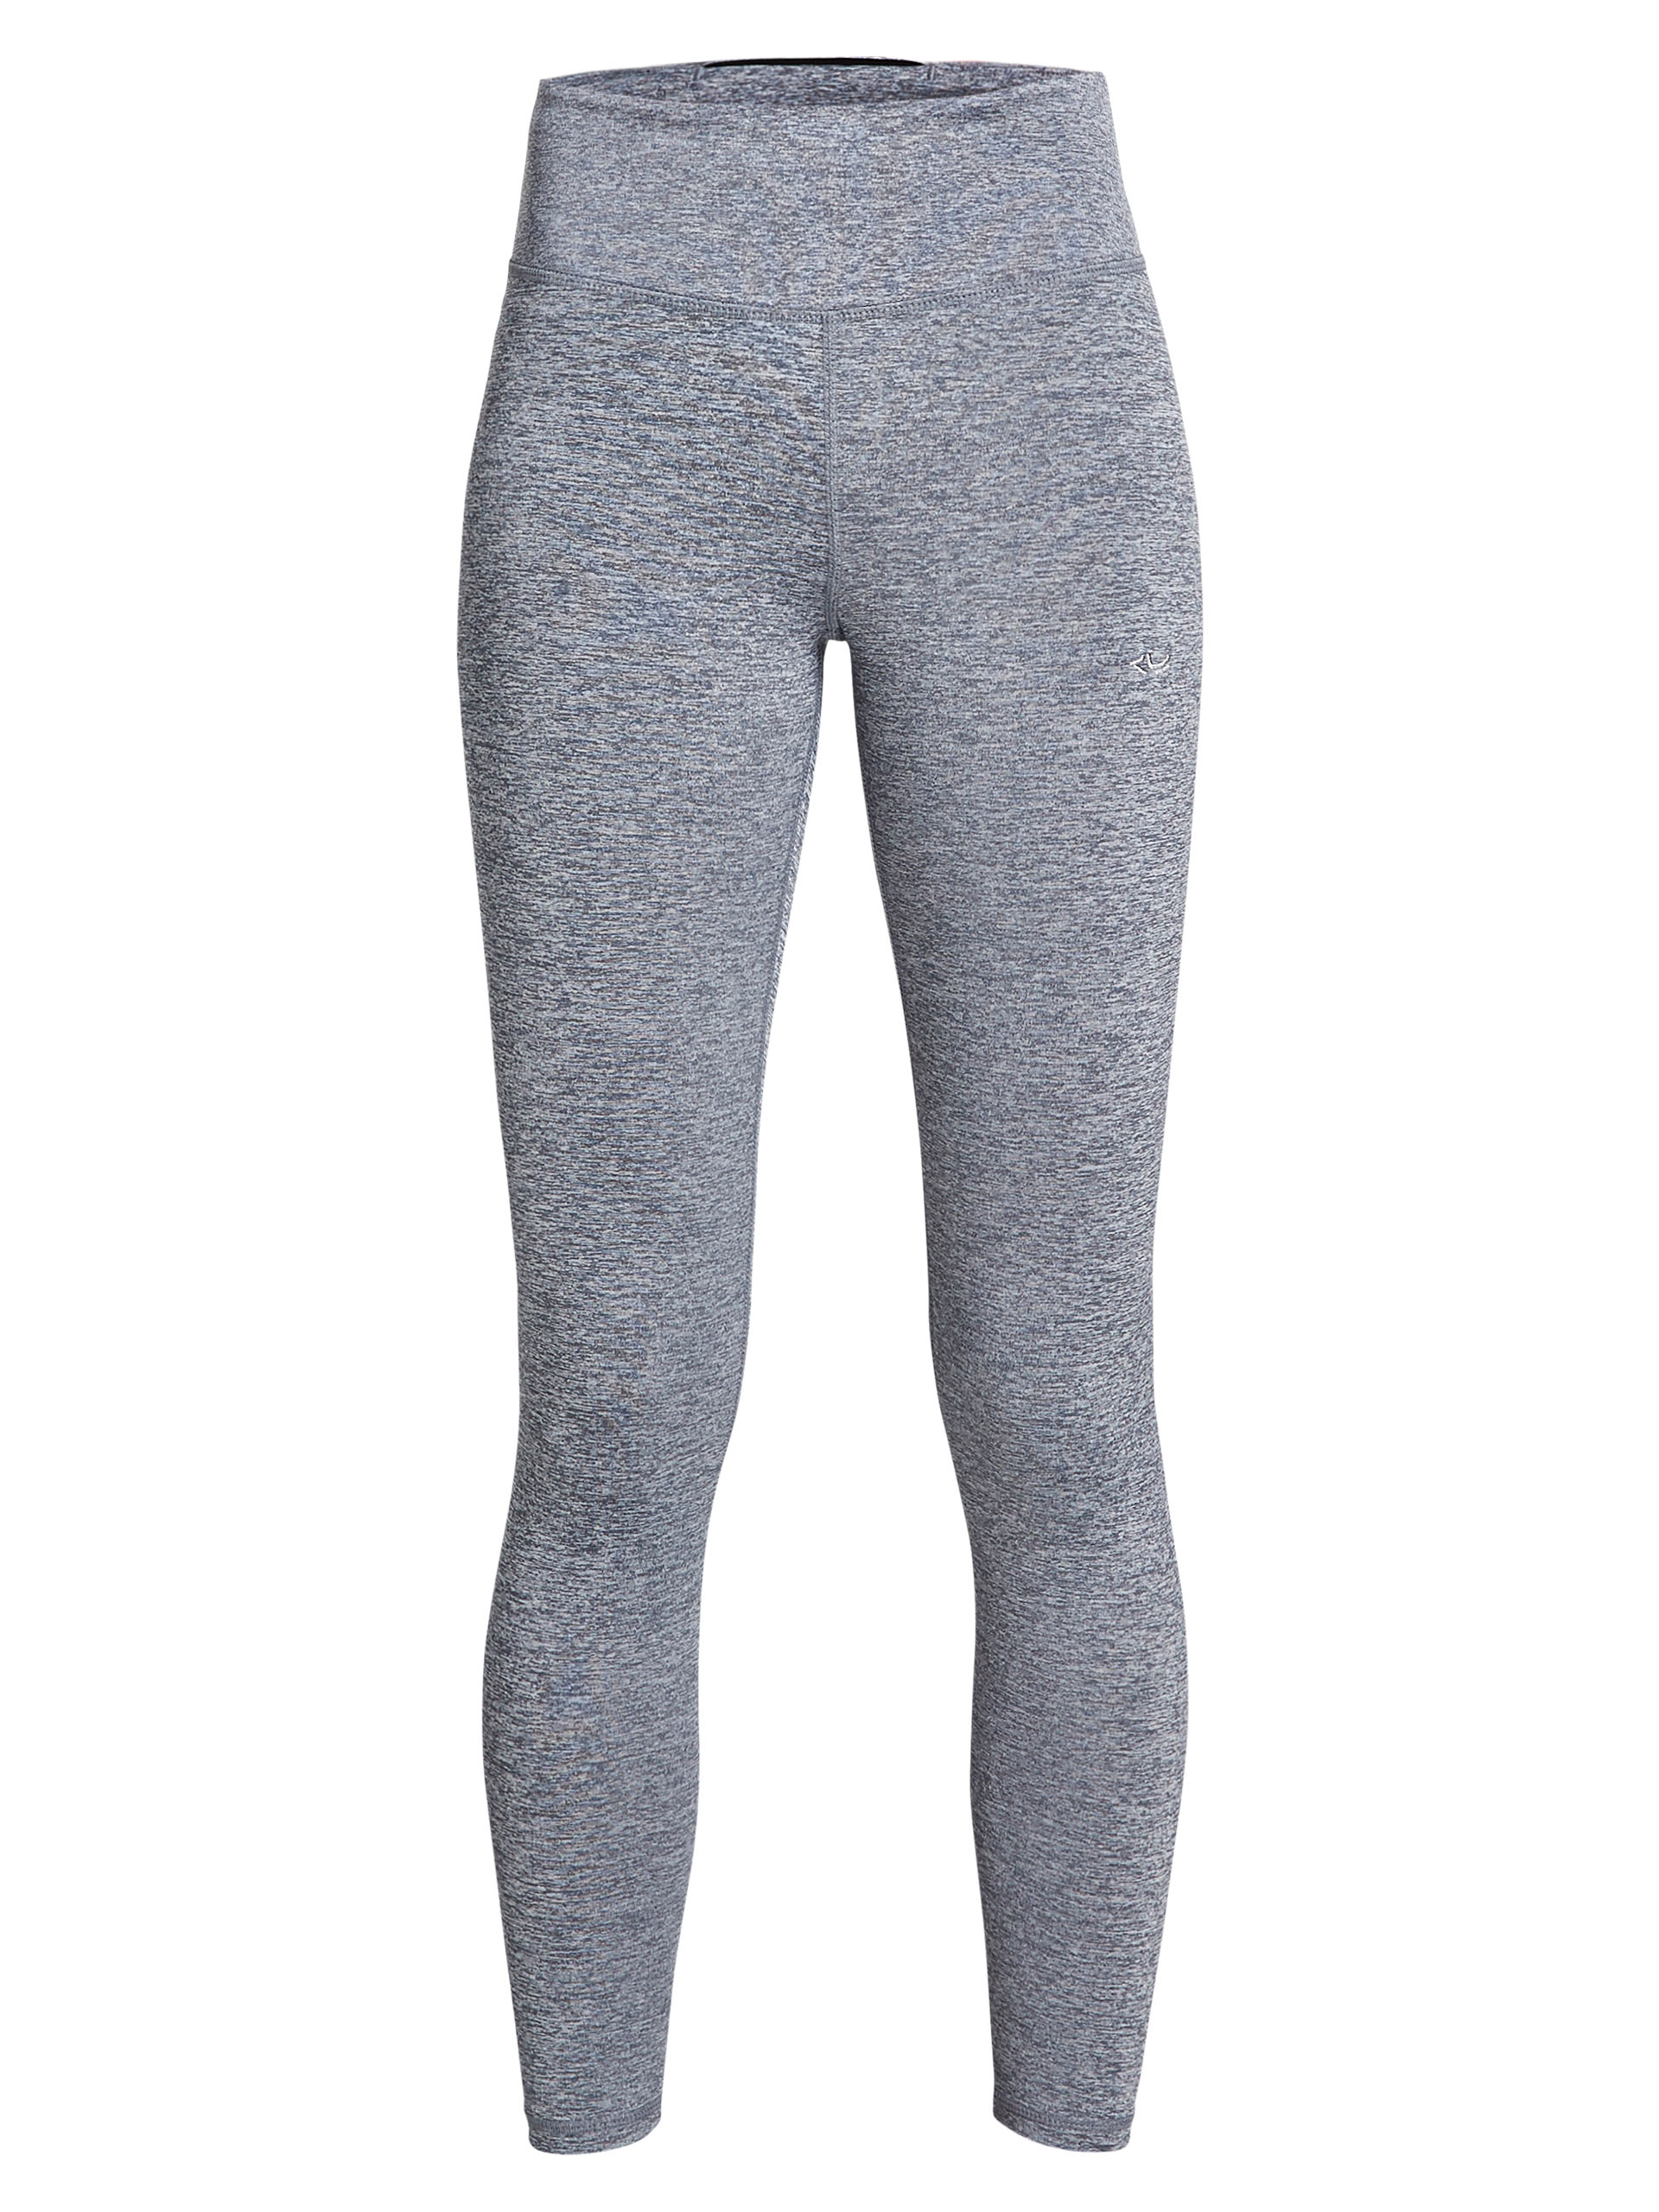 Grijze dames sport legging Rohnisch - Lasting tights